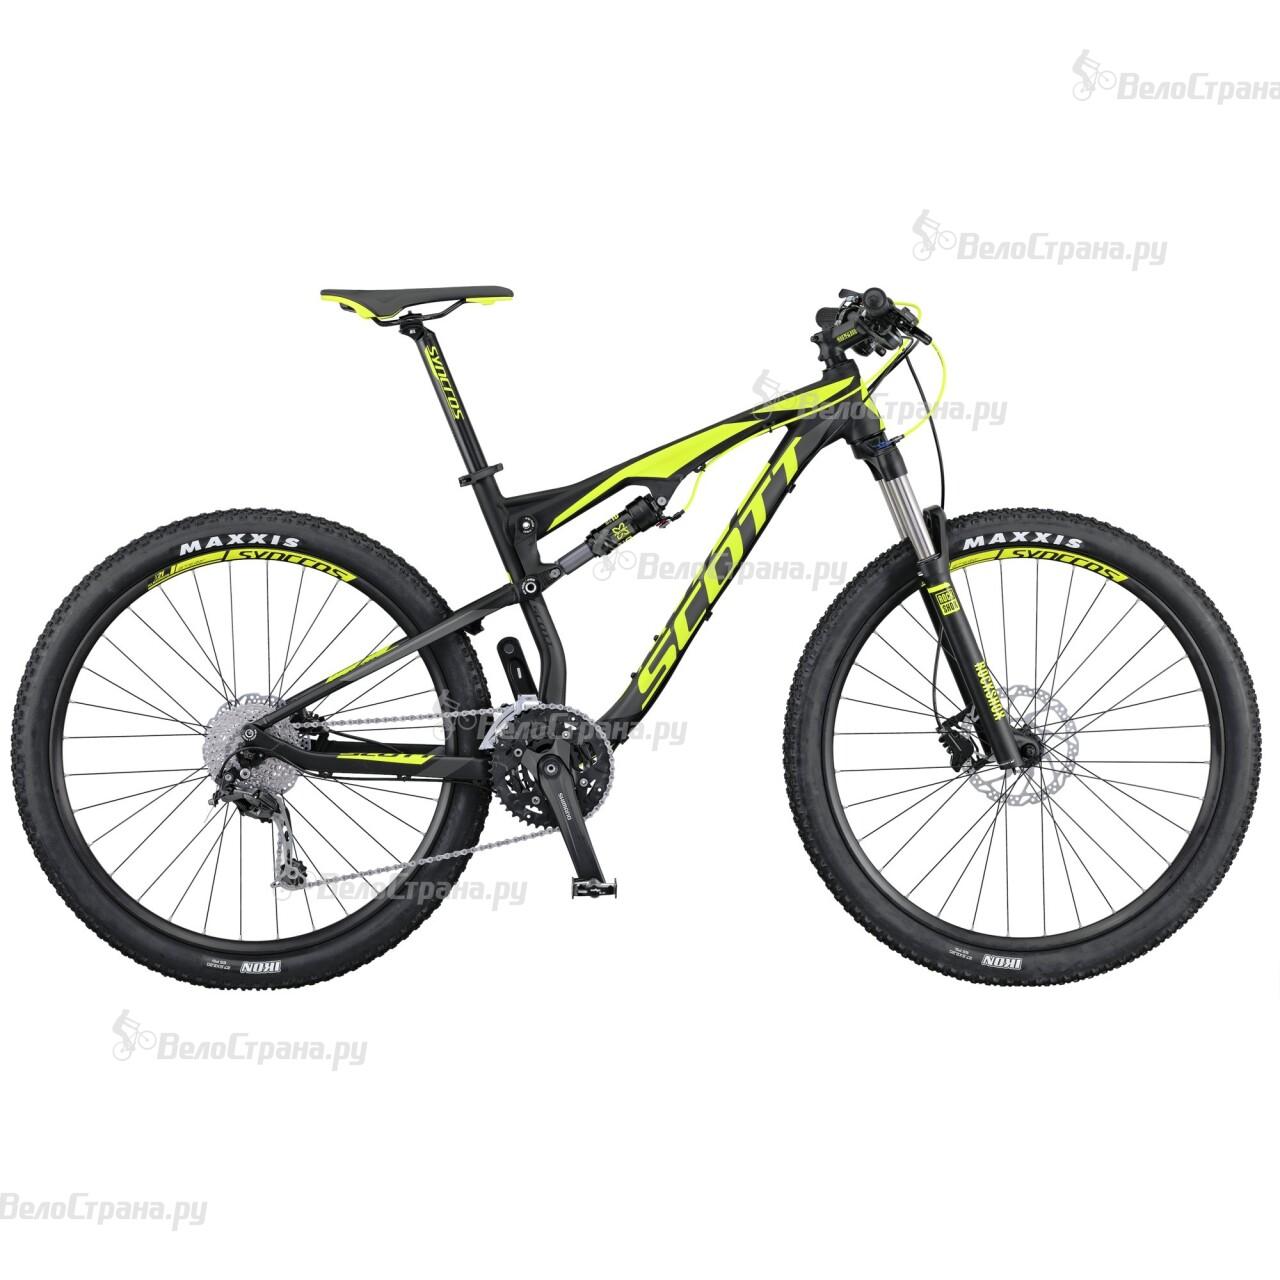 Велосипед Scott Spark 760 (2016) телефон wileyfox spark